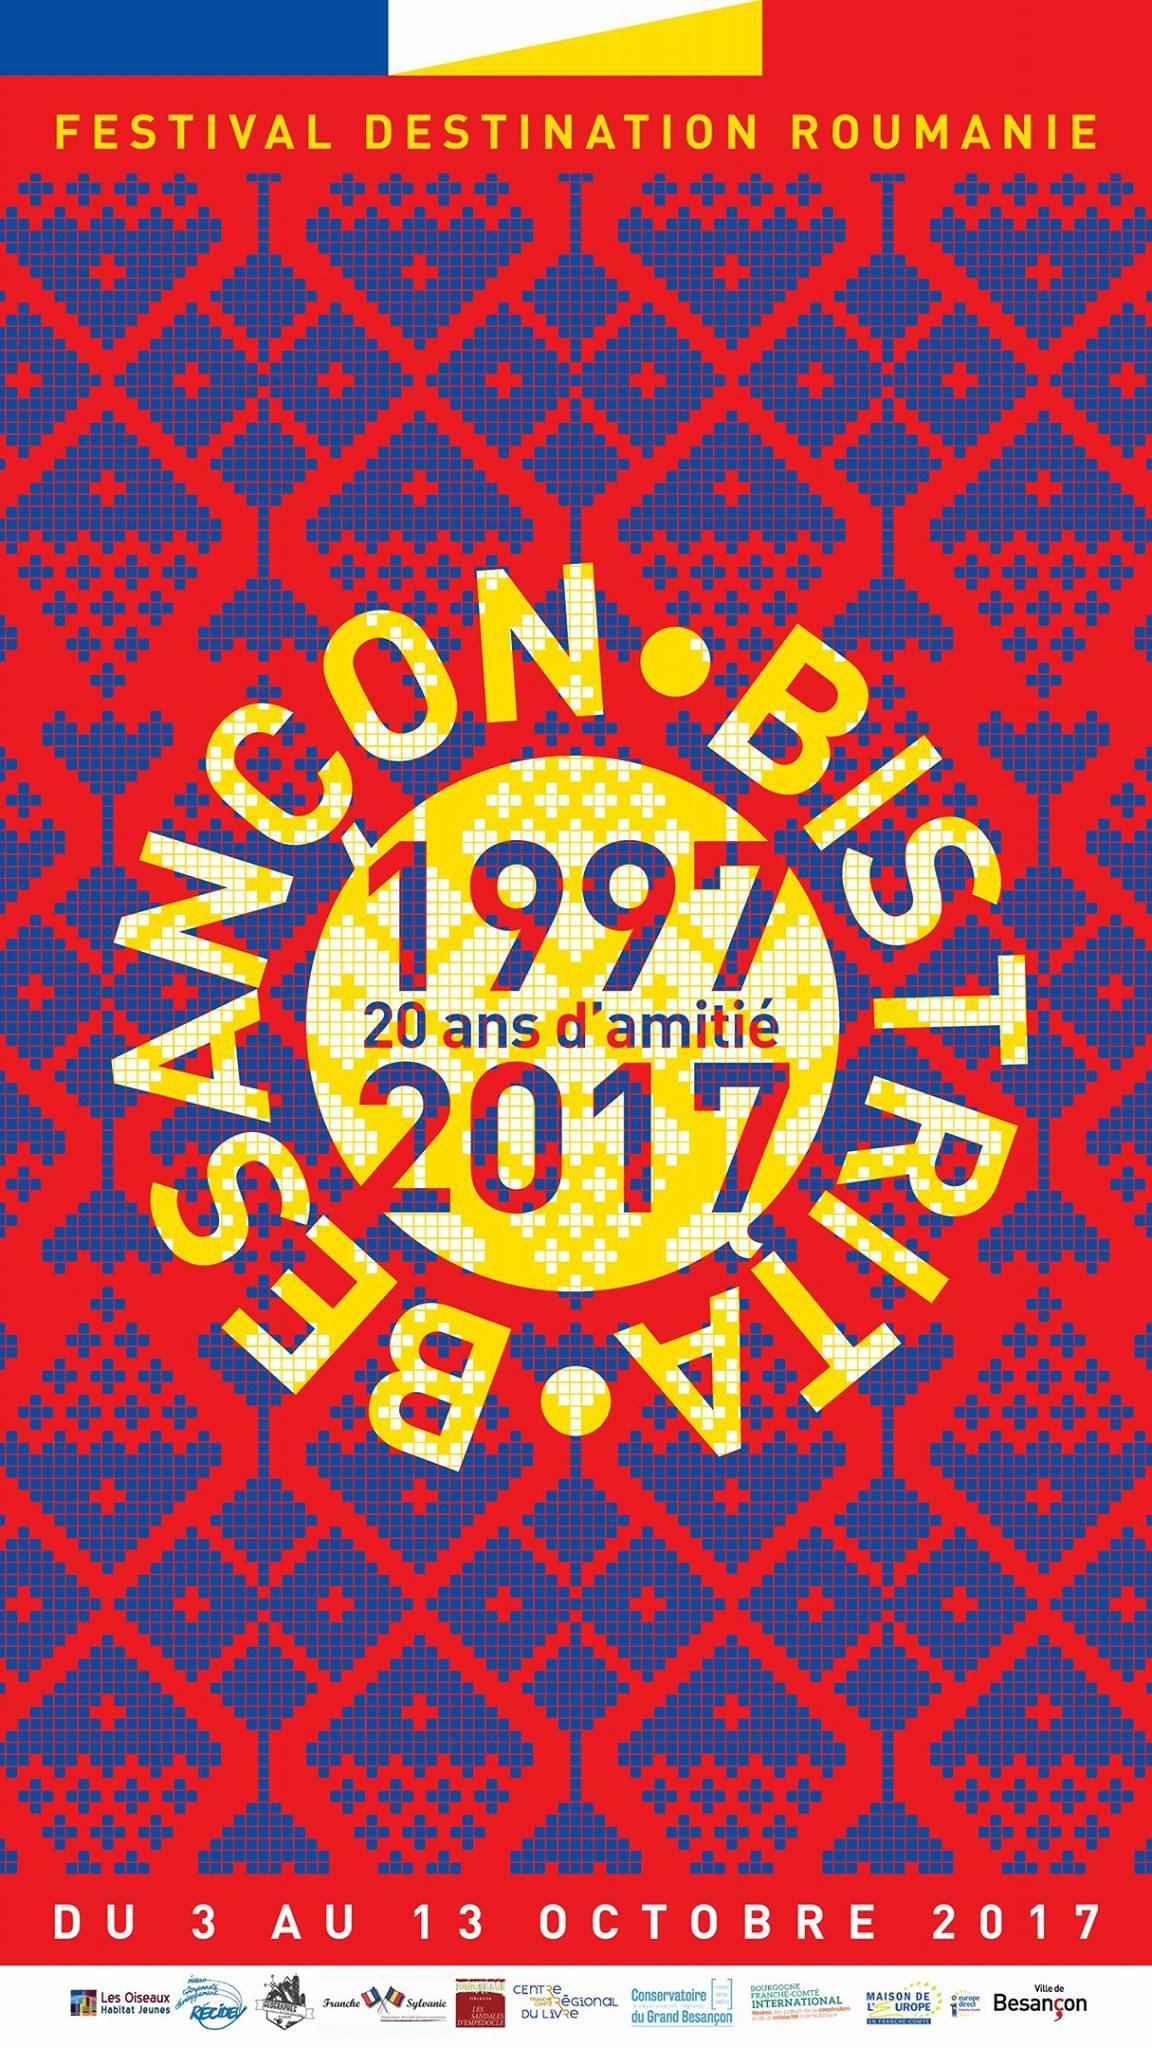 Festival Destination Roumanie